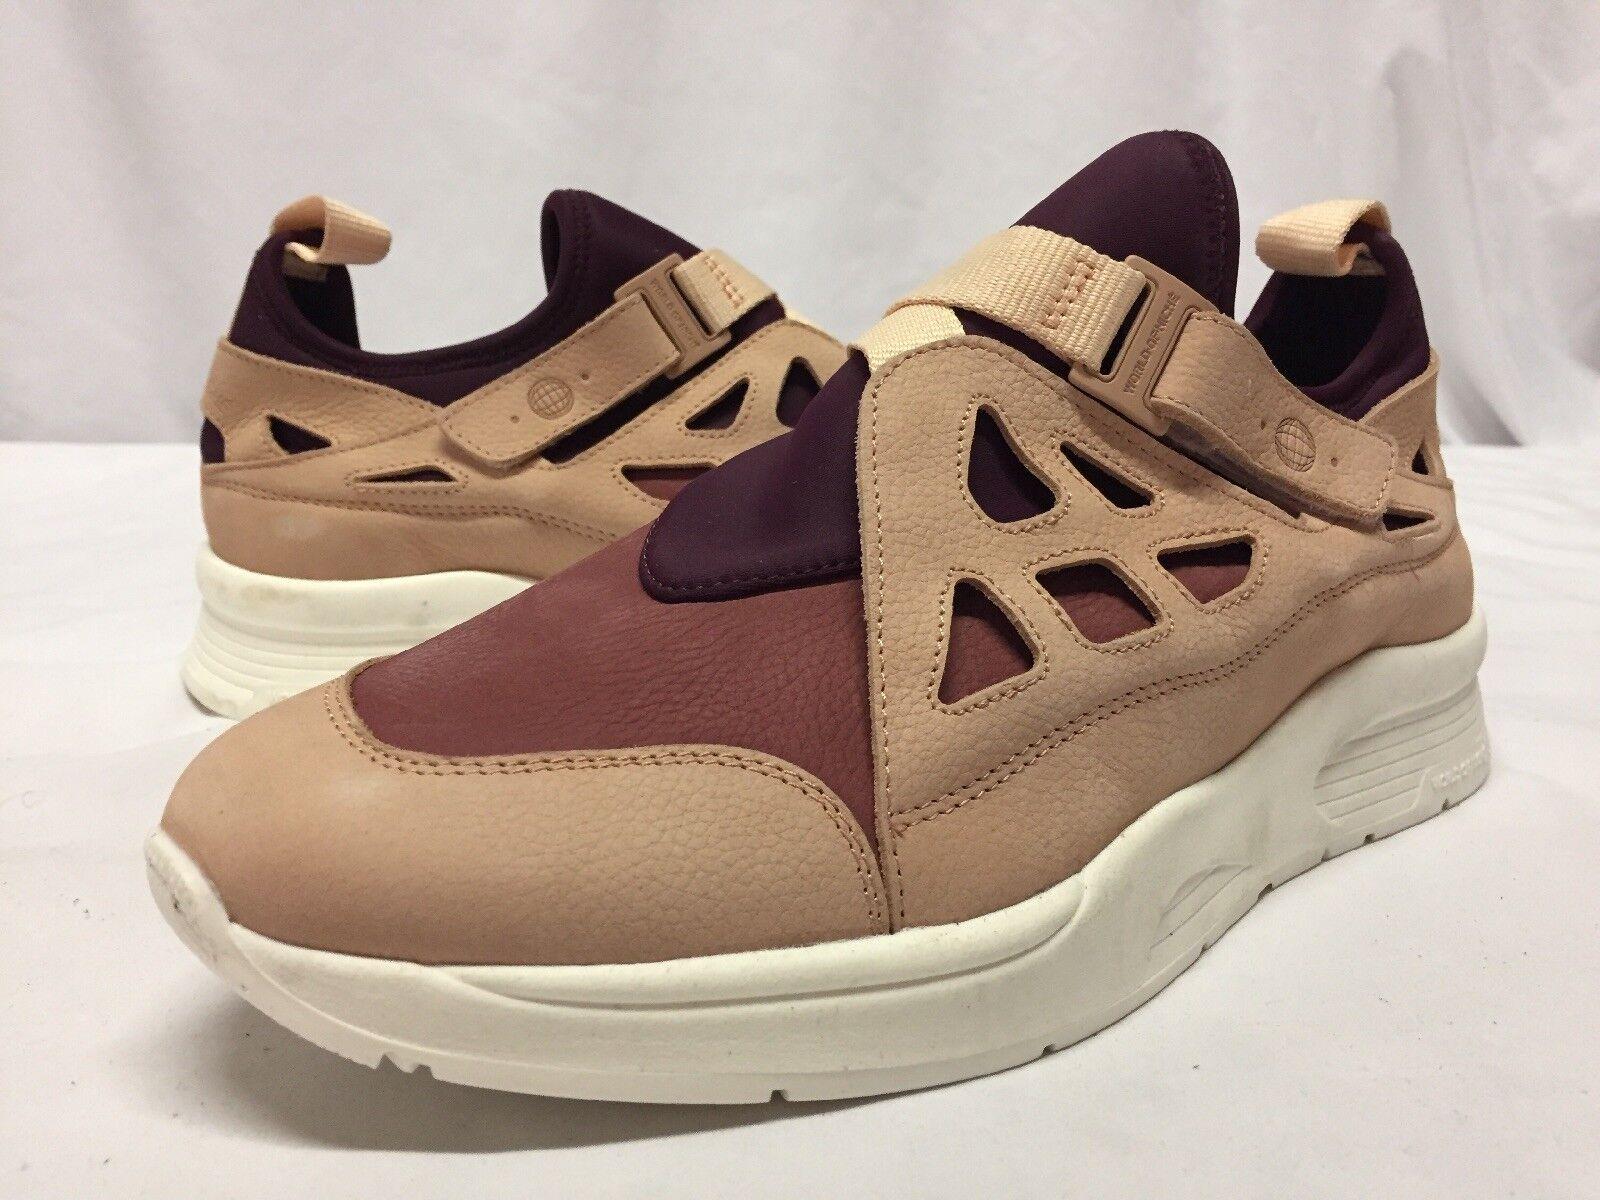 World Of Niche Torpedo Ronnie Fieg x Sneaker Boots Size 45...US 12..Ni NNA